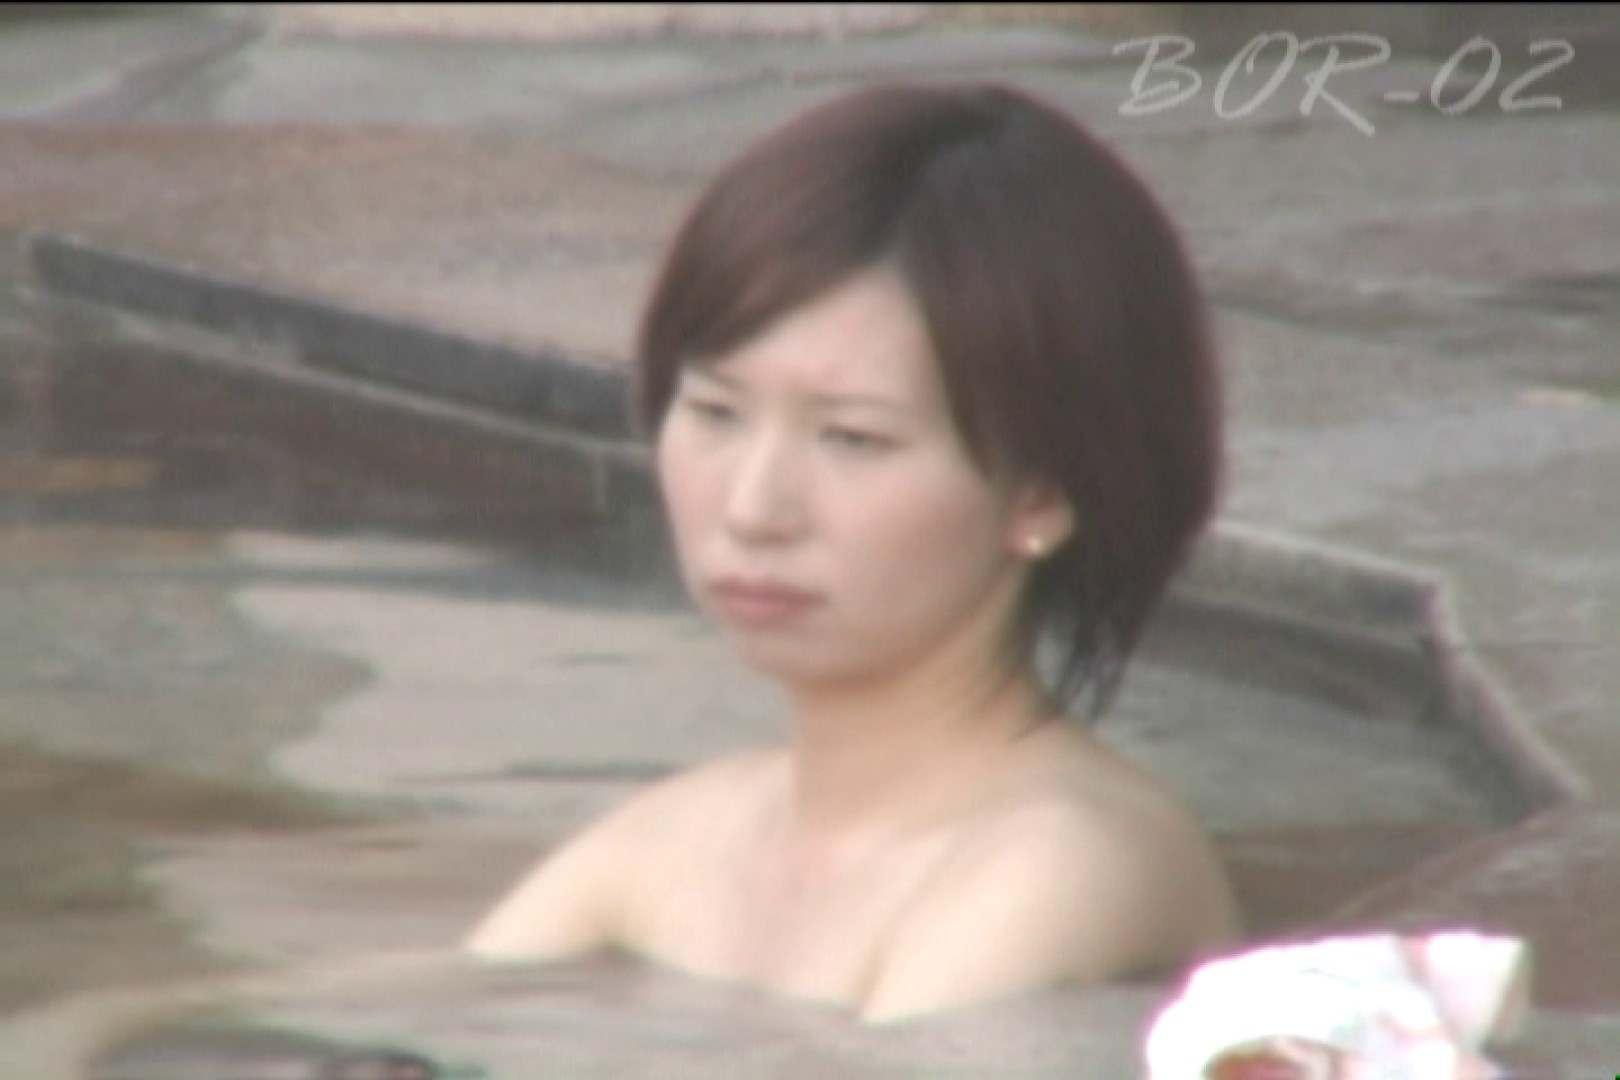 Aquaな露天風呂Vol.475 盗撮師作品  87pic 12